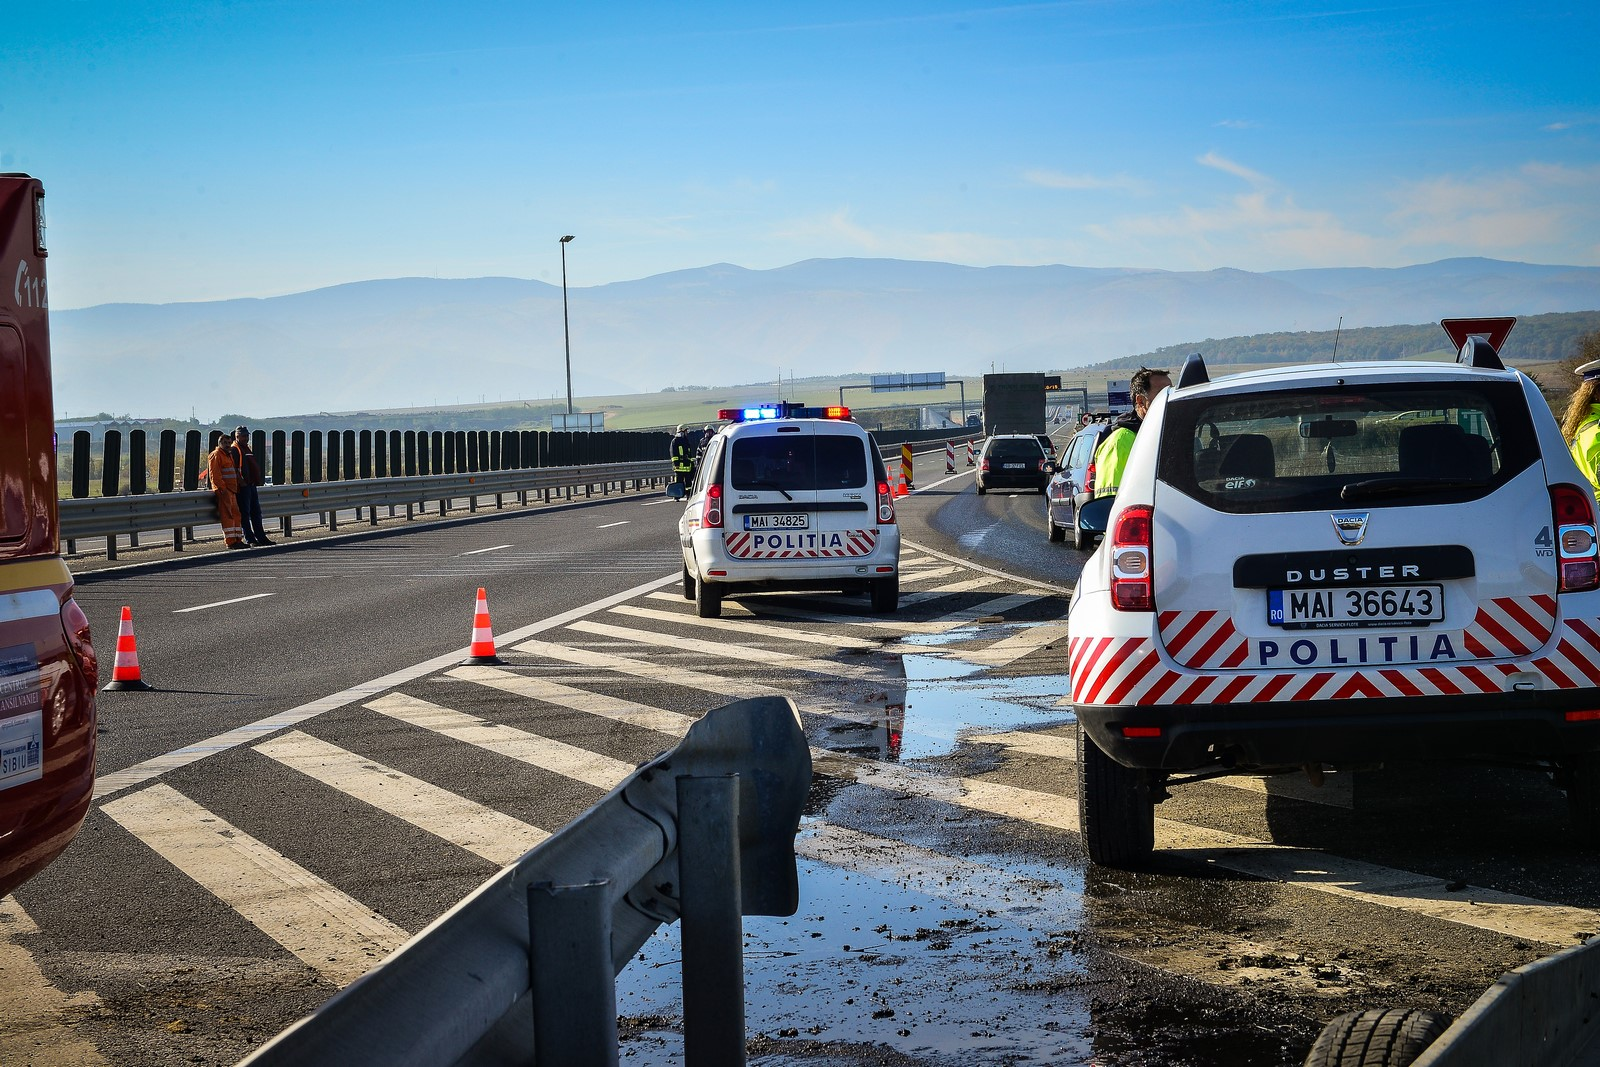 Un șofer a adormit la volan și s-a răsturnat cuTIR-ulpe A1 Sibiu-Deva. Trafic îngreunat